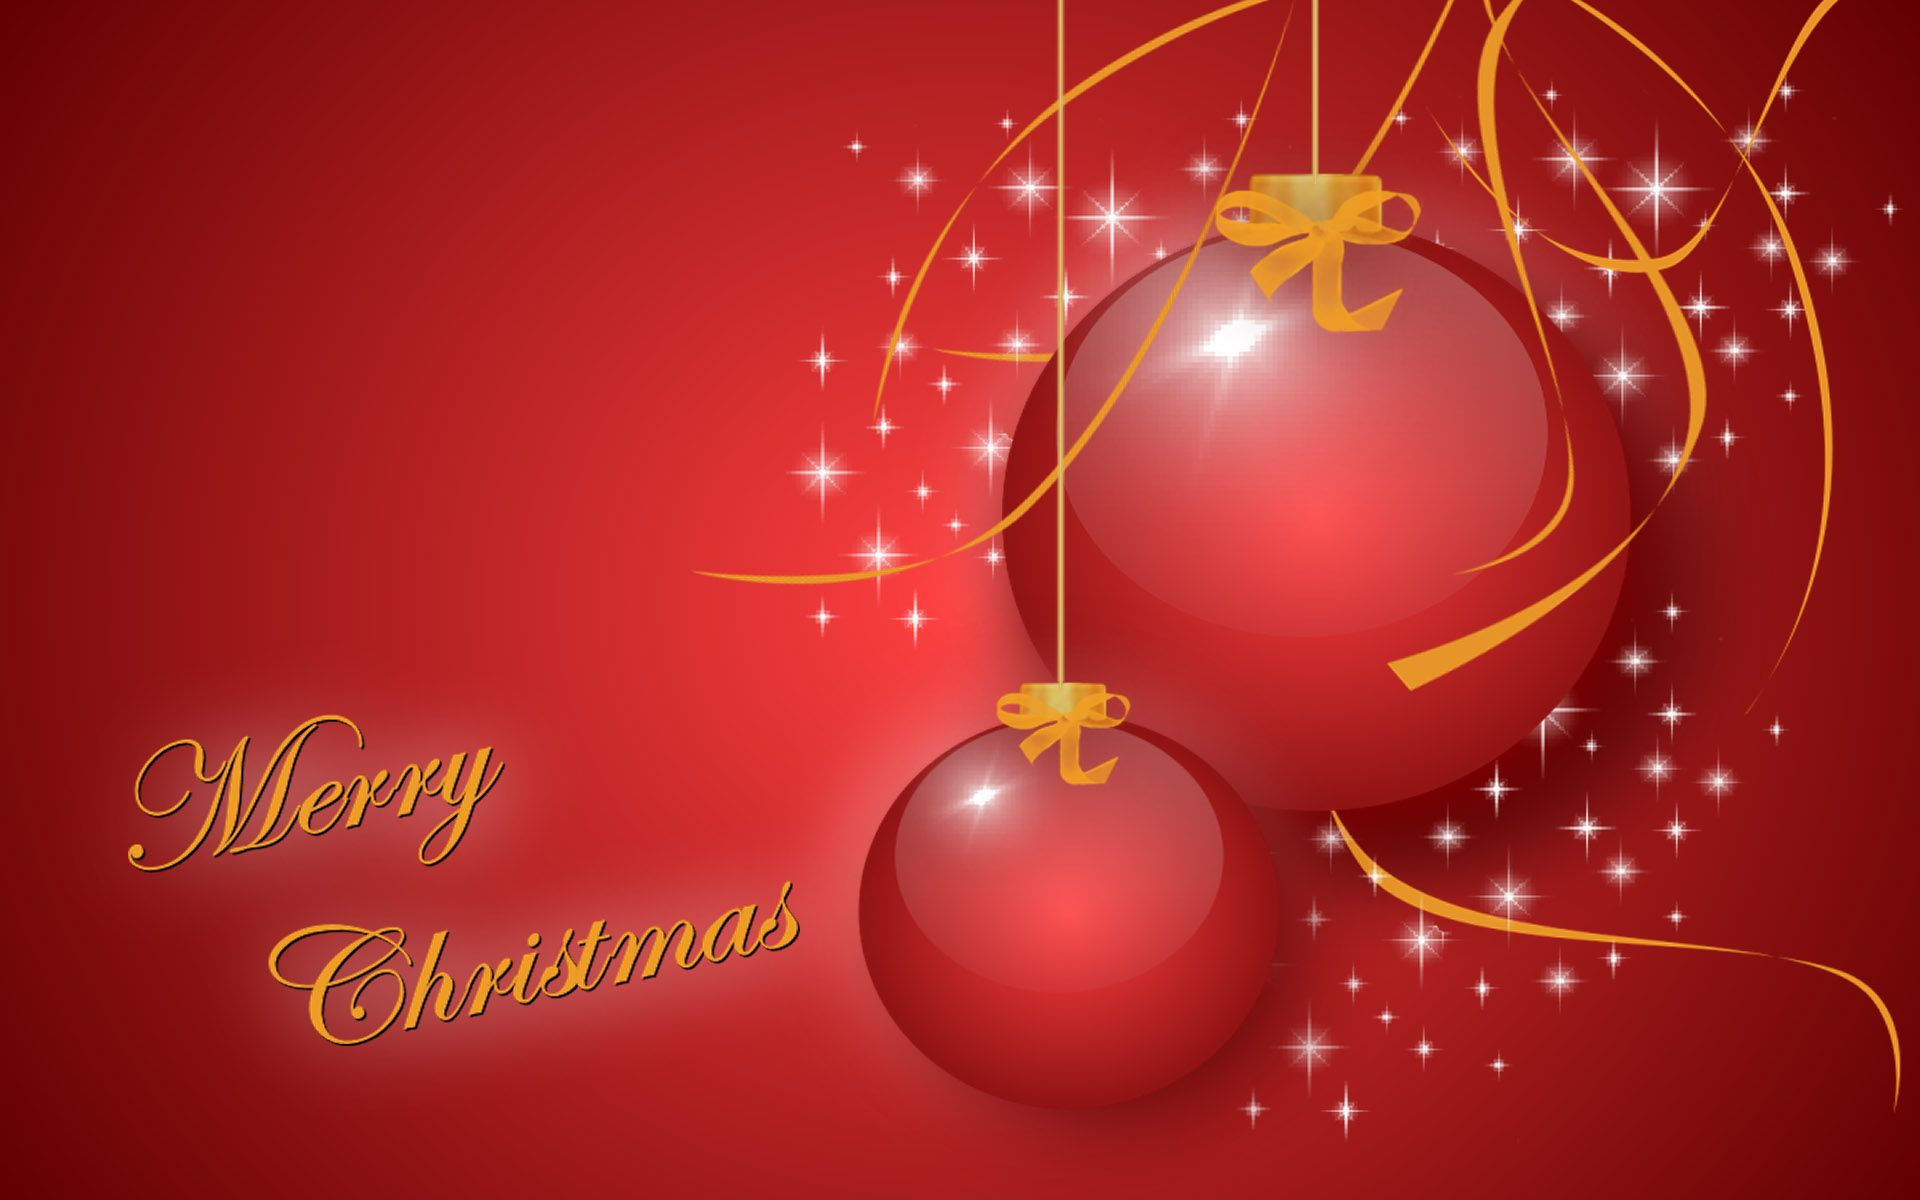 Red Red Red Cartolina Buon Natale Auguri Natale Natale Feliz natal wallpaper hd